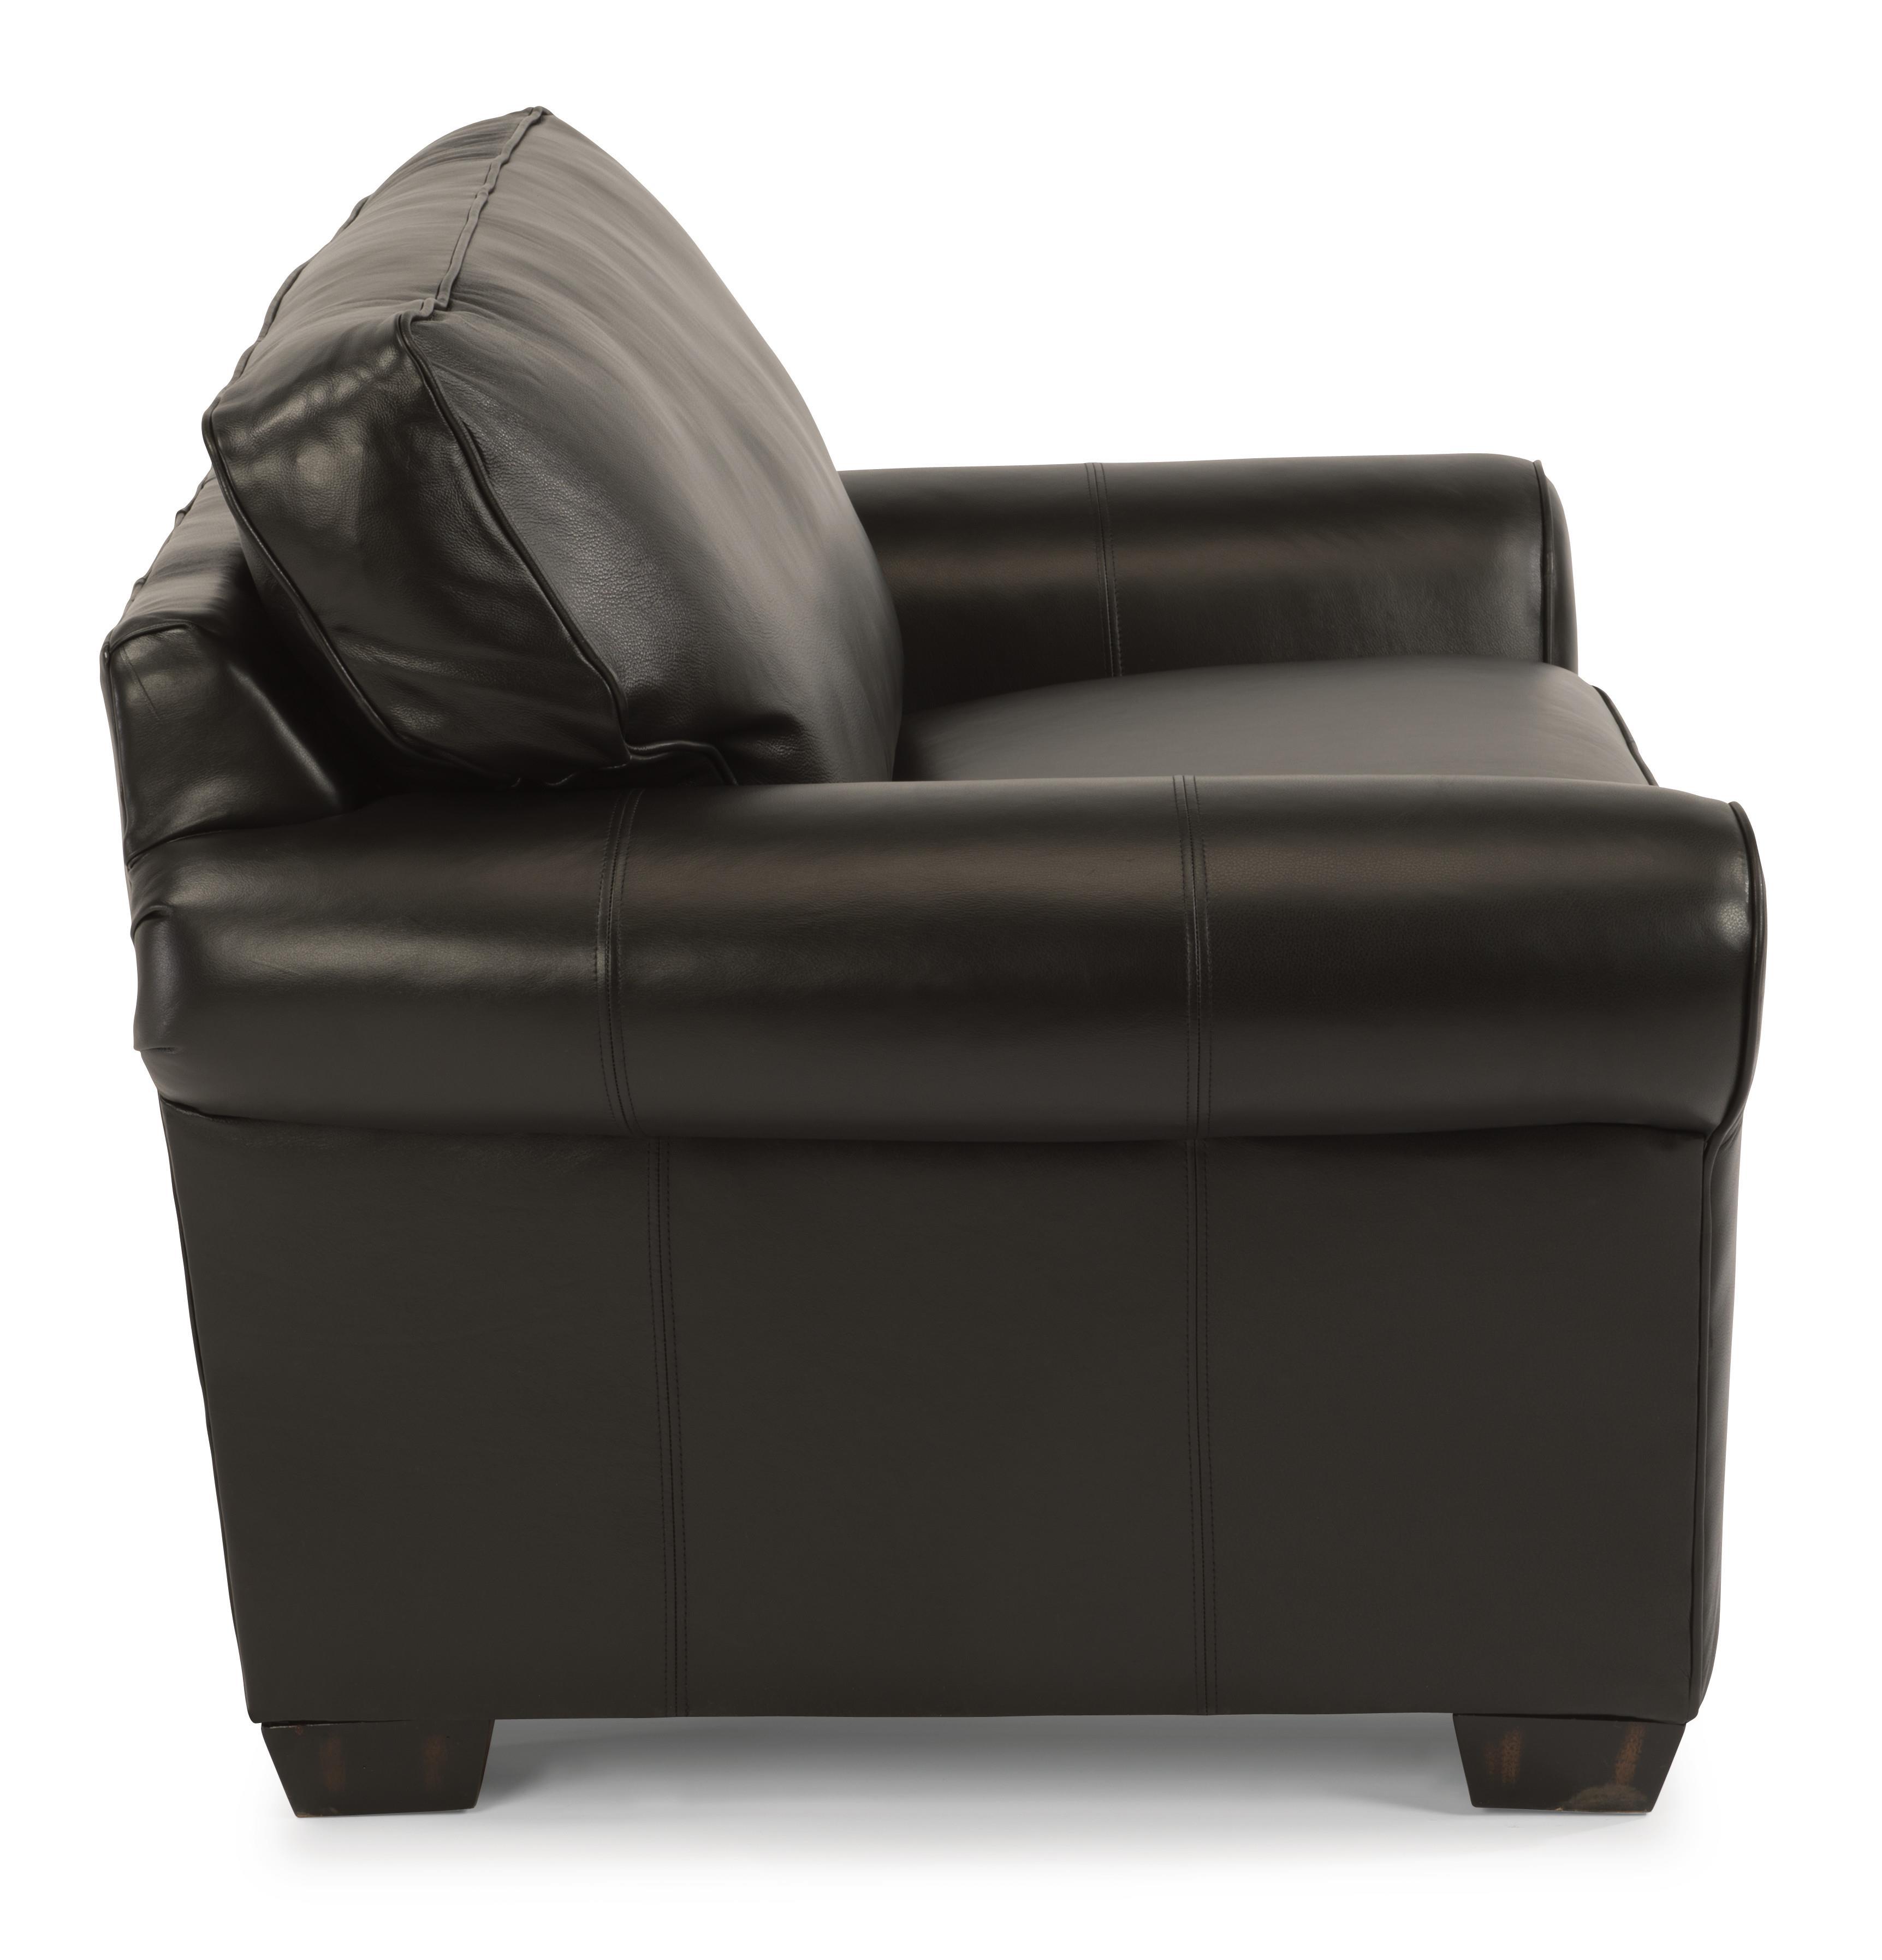 Flexsteel Vail Sofa Price: Flexsteel Vail Chair And 1/2